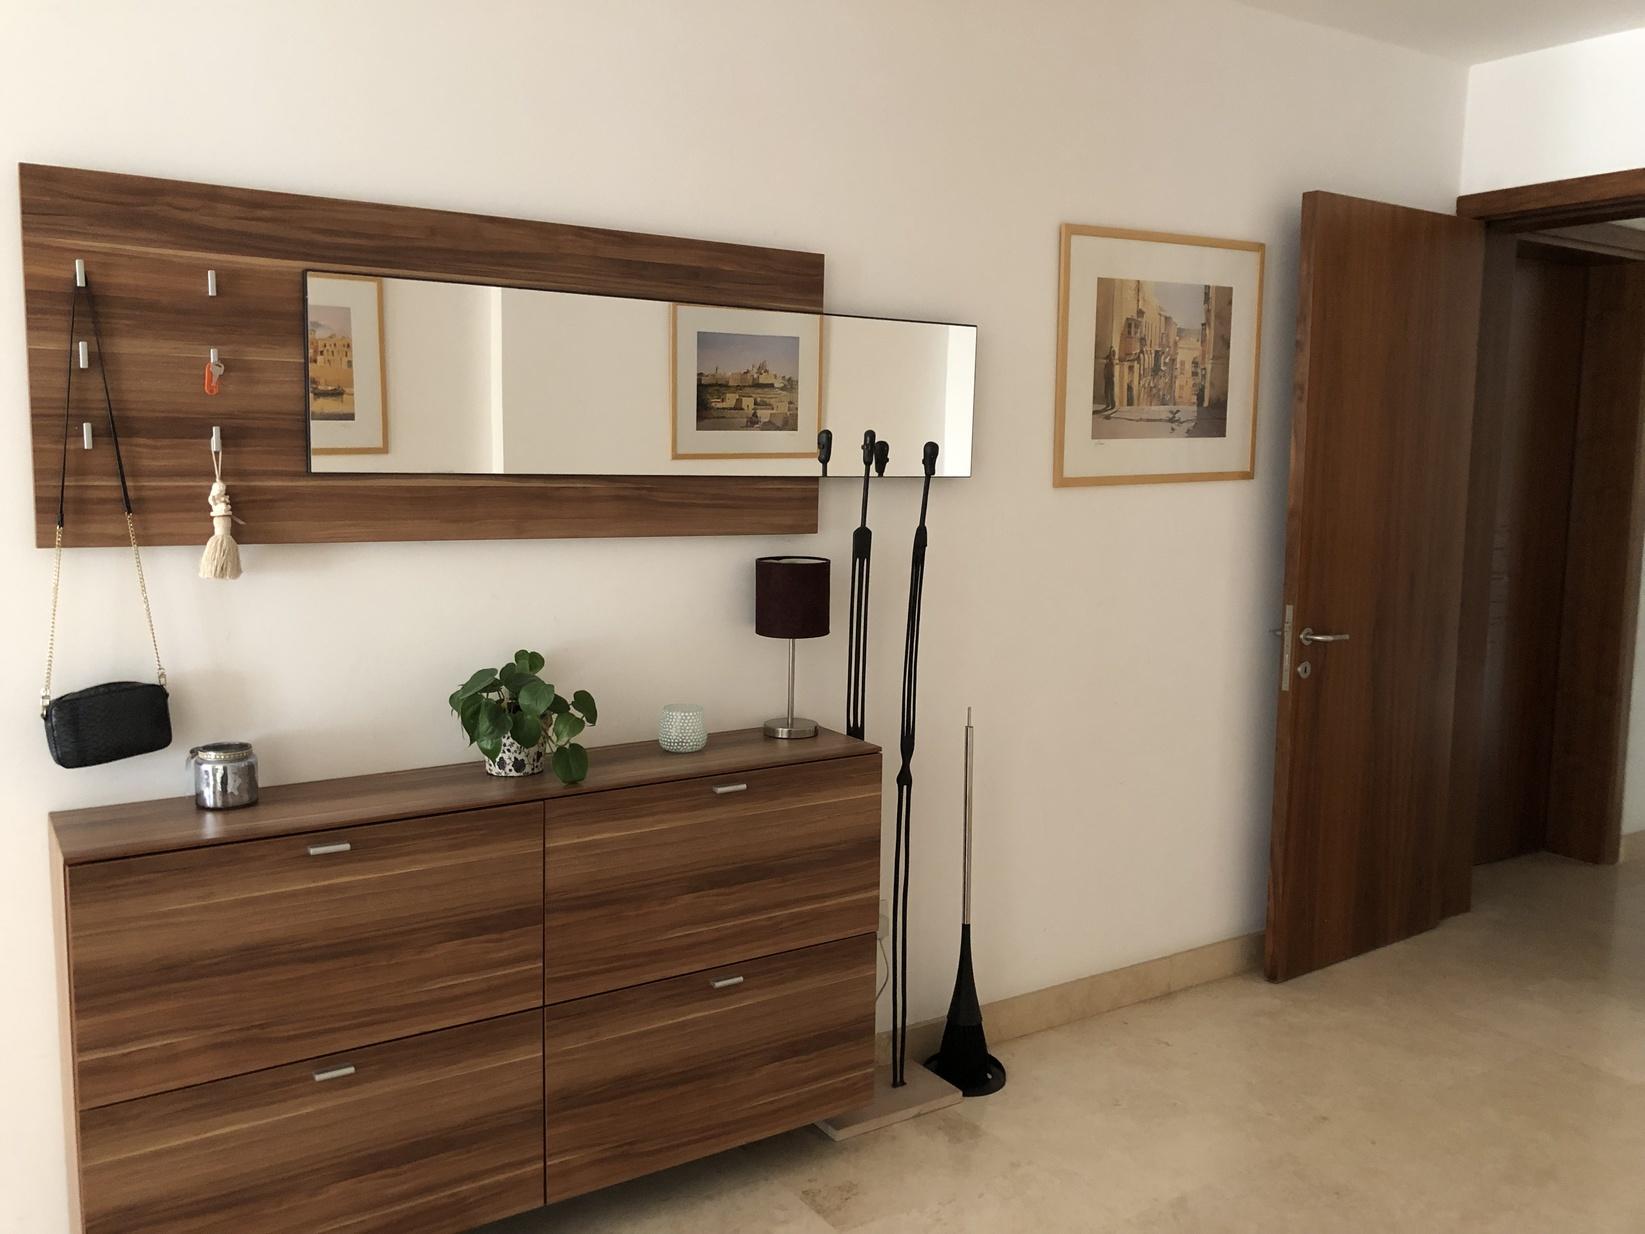 3 bed Apartment For Rent in Sliema, Sliema - thumb 27